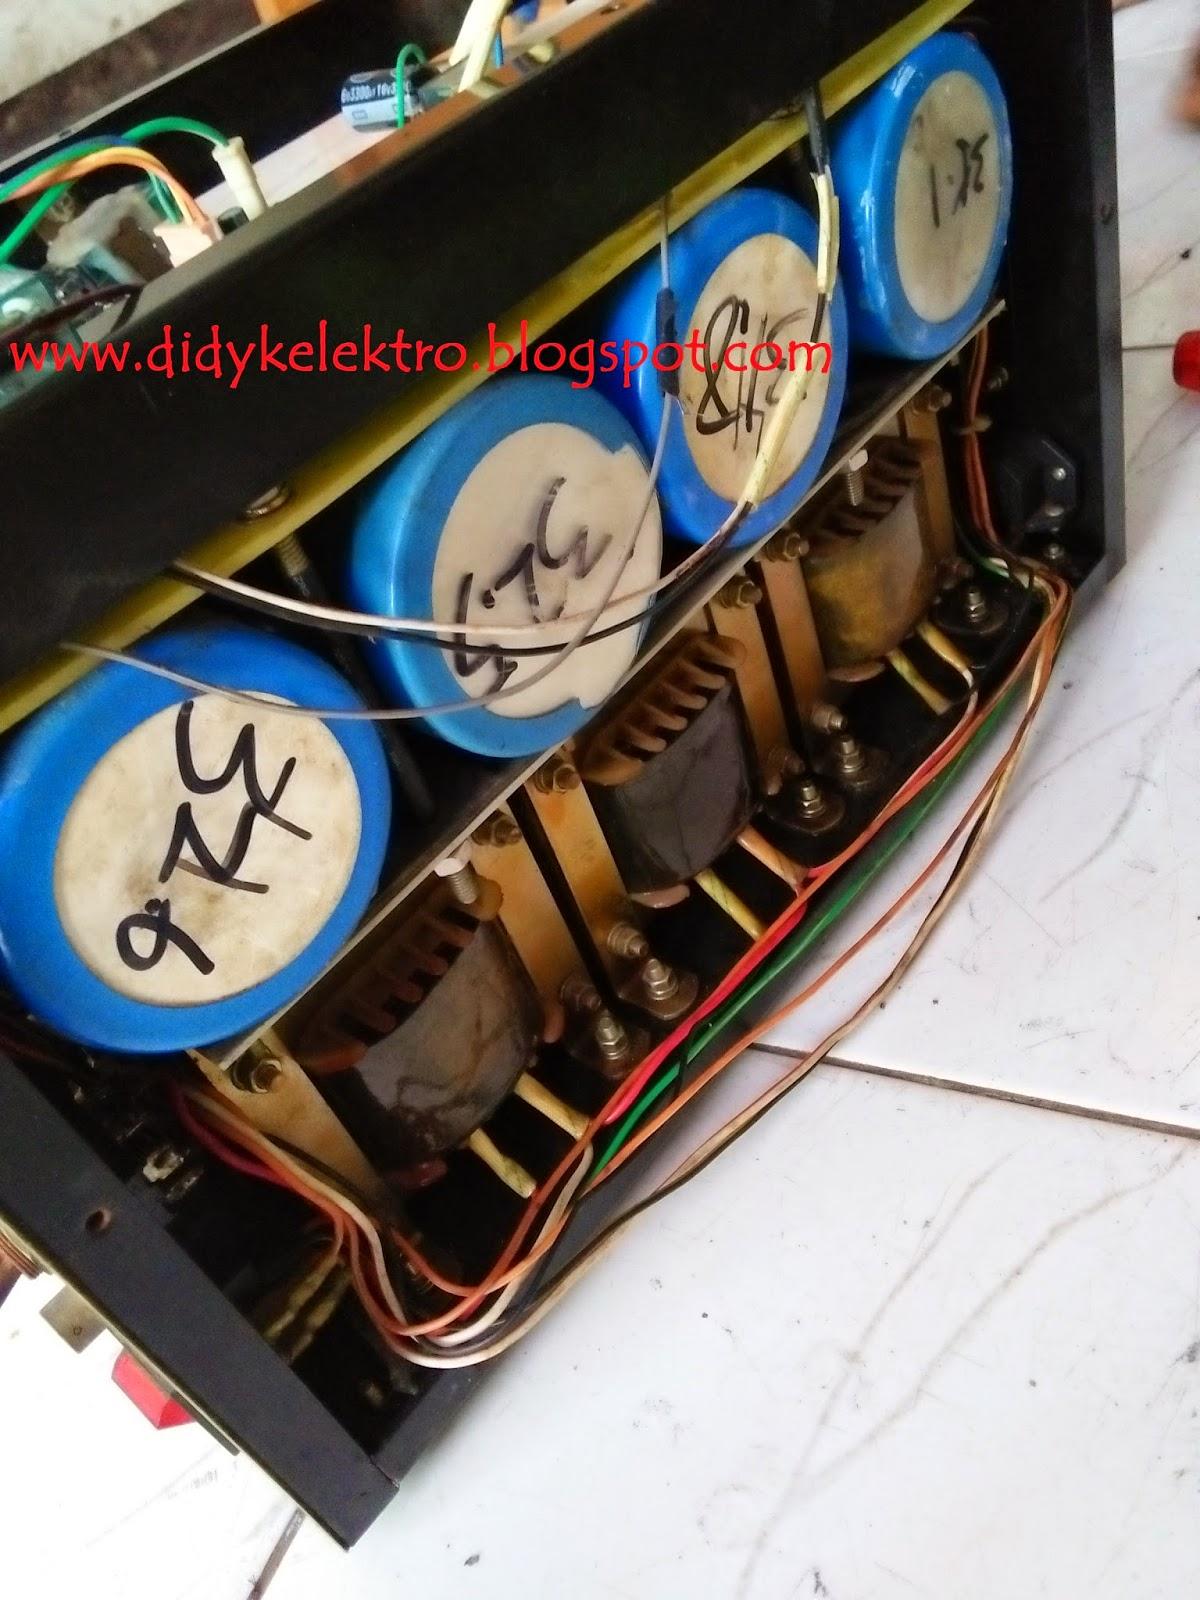 Mesin Las Listrik Lakoni Mma 120 Daftar Harga Terkini Dan Watt Kecil Inverter Welding Machine Igbt 120a 450w Hl Low H N L Spot Capasitor Discharger Api